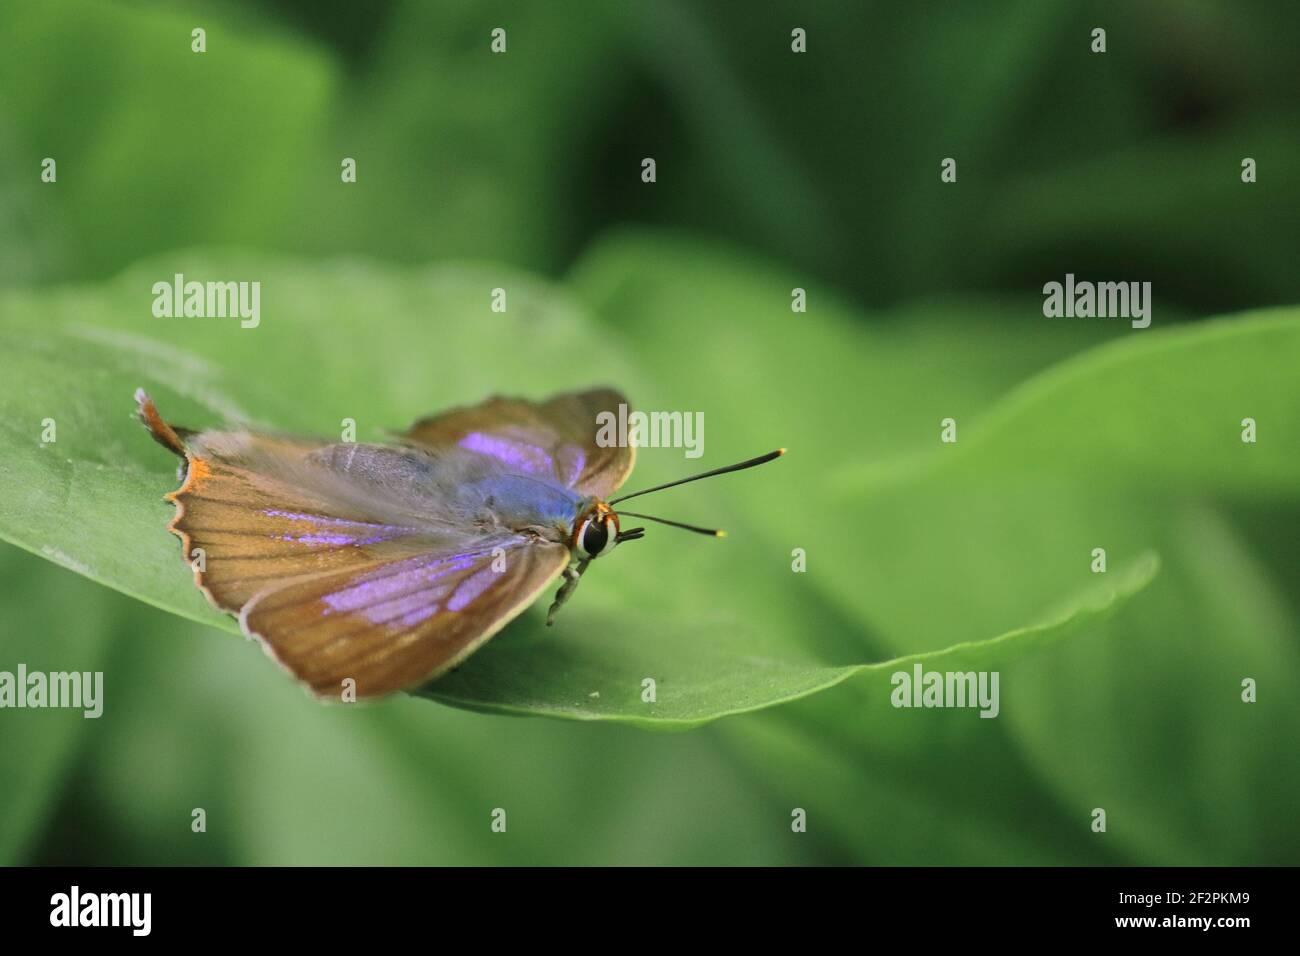 mariposa aberrante de color azul marino o aberrante de color azul silvestre (arhopala abseus) en una hoja verde, en un bosque lluvioso en bengala occidental, india Foto de stock